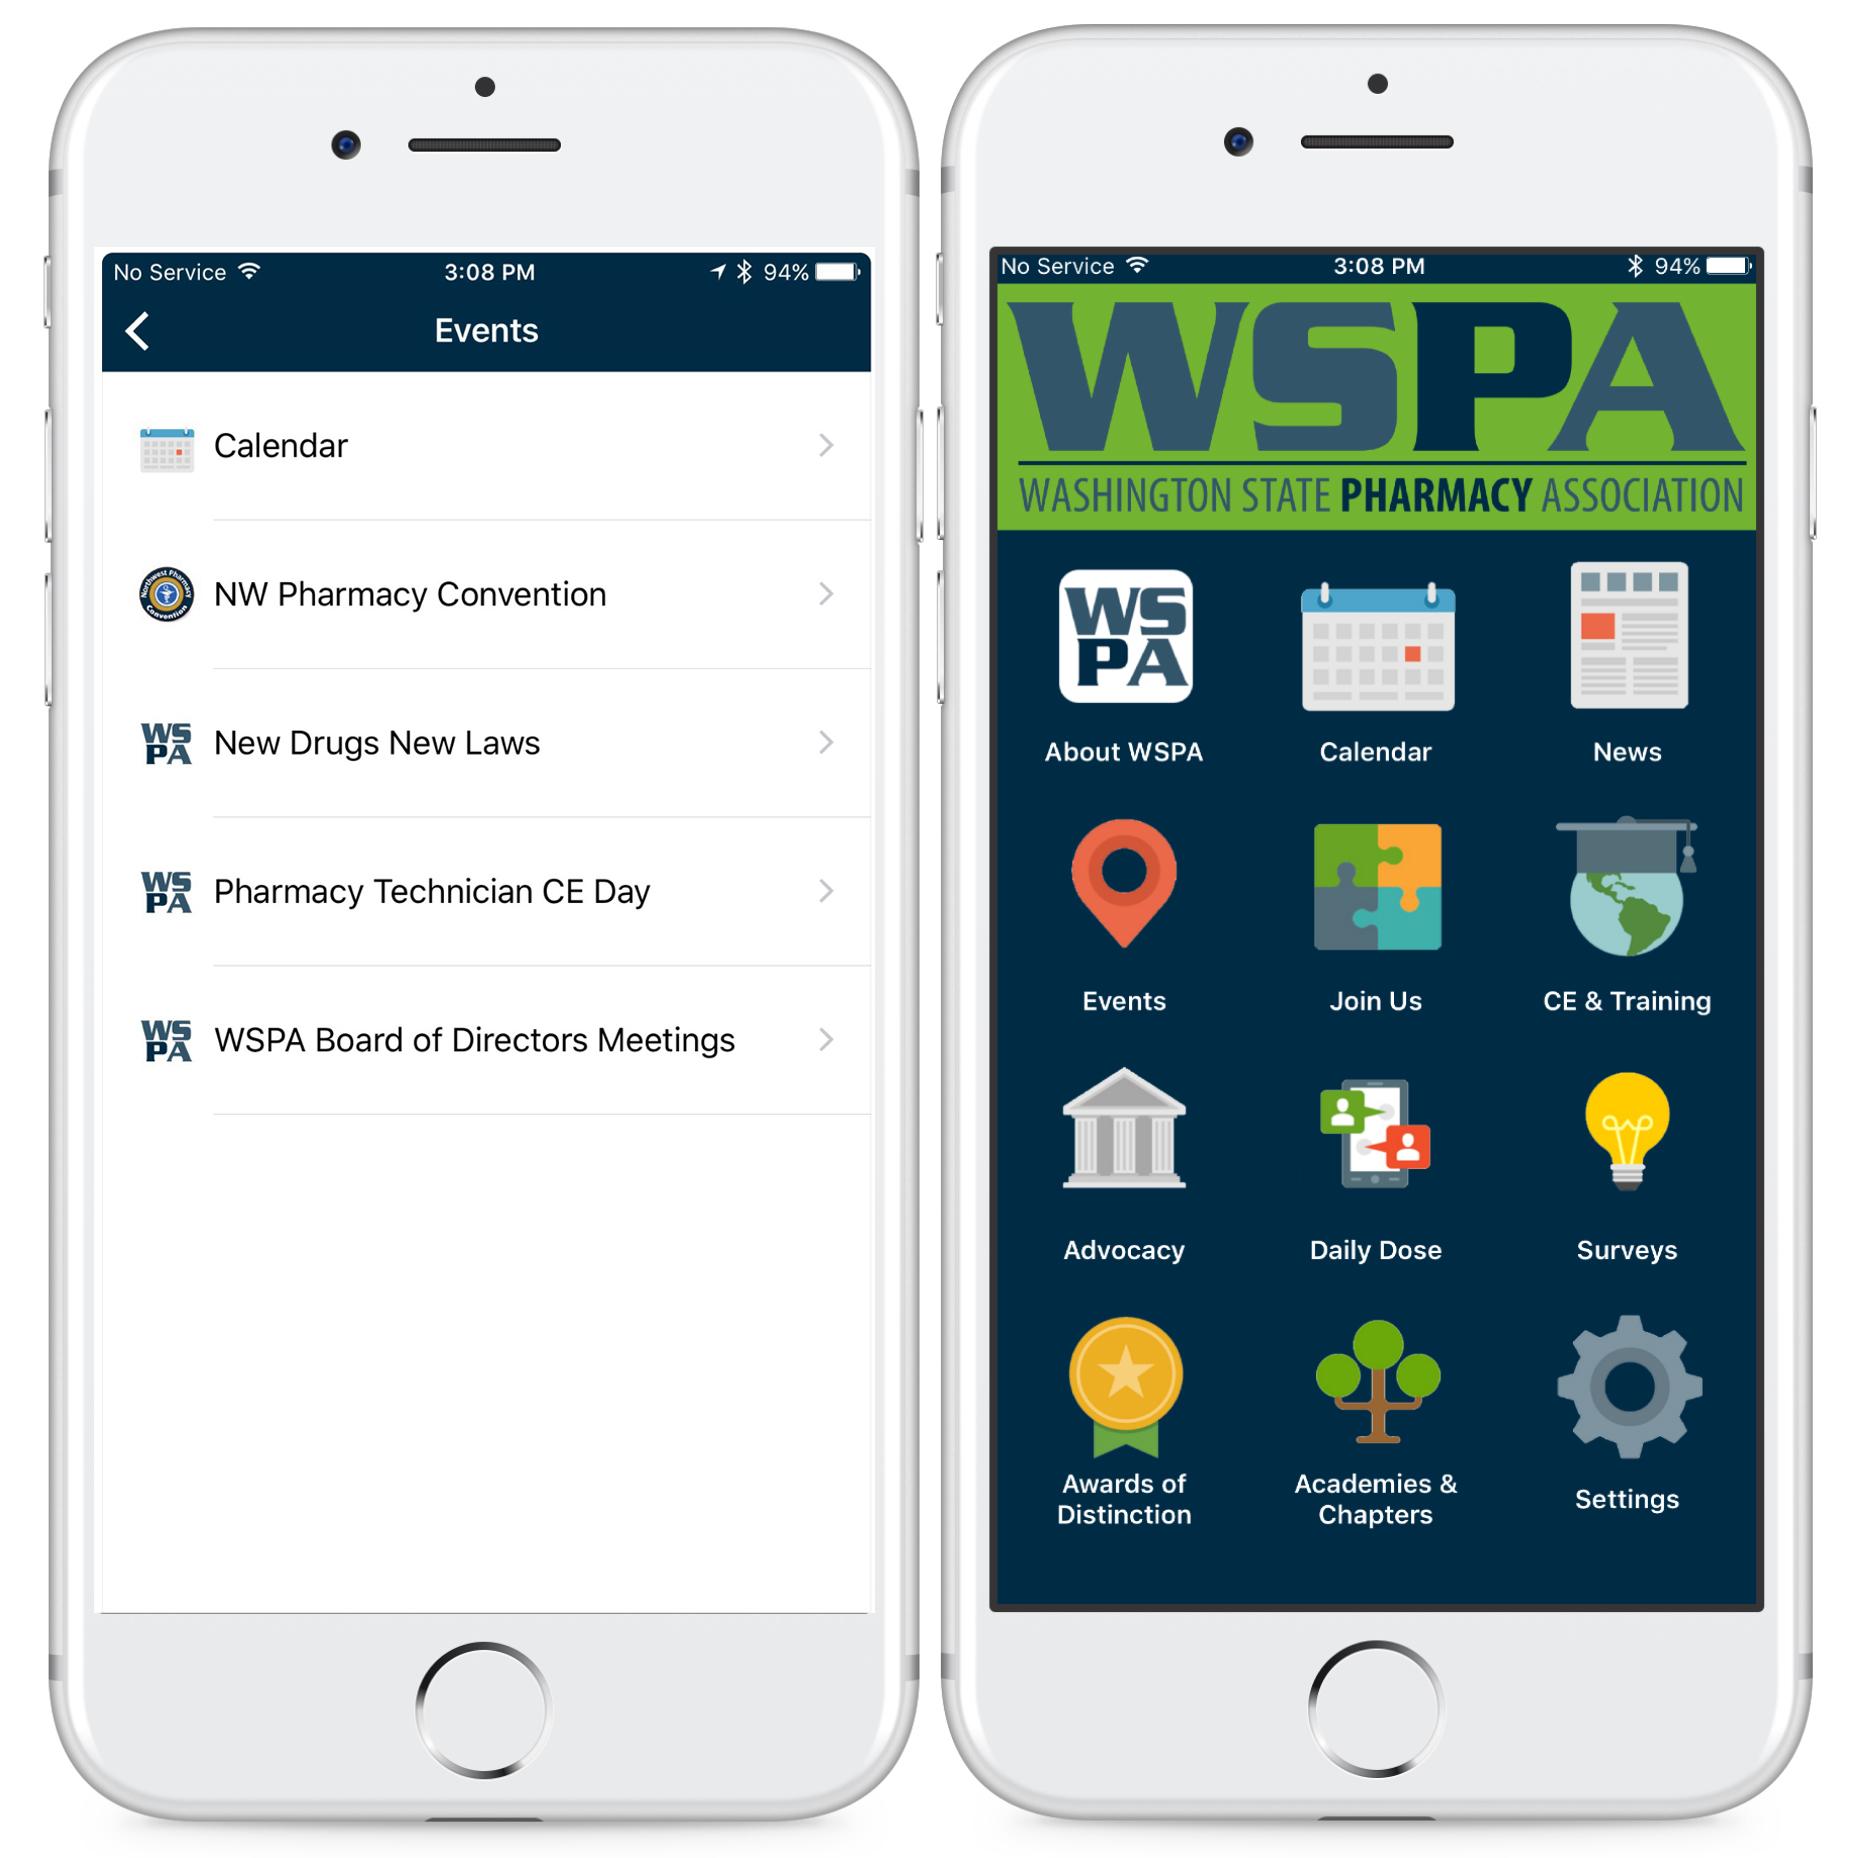 WSPA app